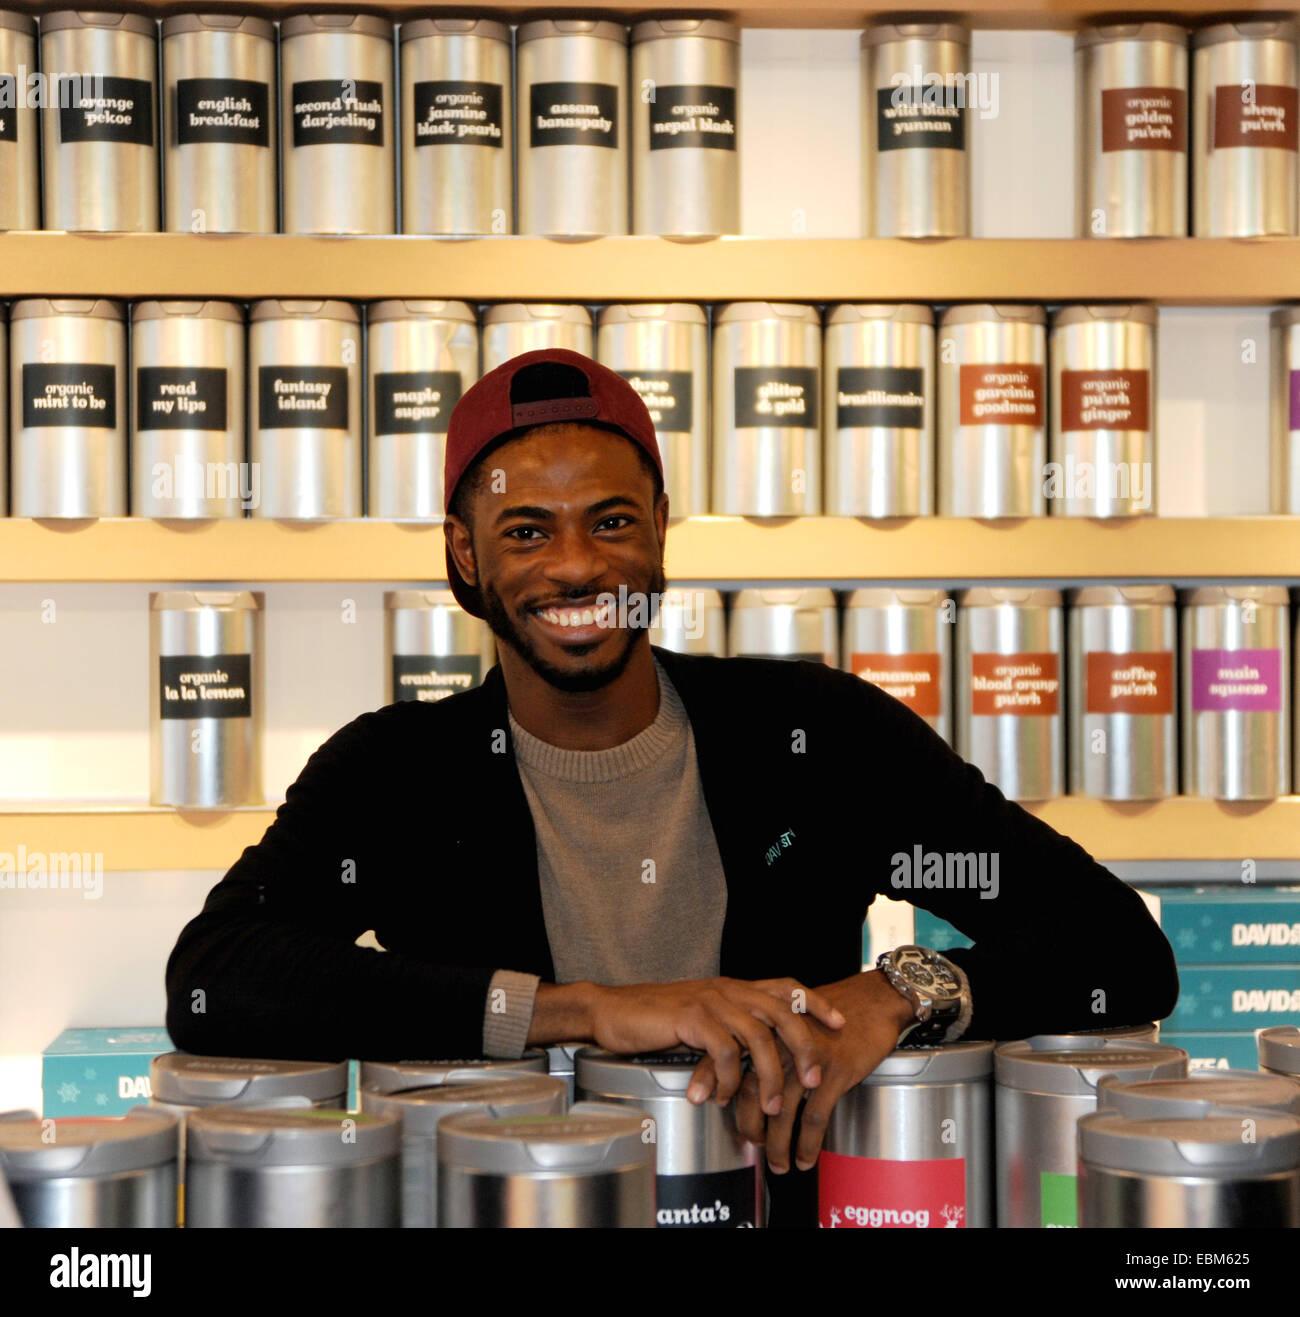 manhattan new york usa store assistant at davids manhattan new york usa 2014 store assistant at davids tea shop in bleeker street greenwich village